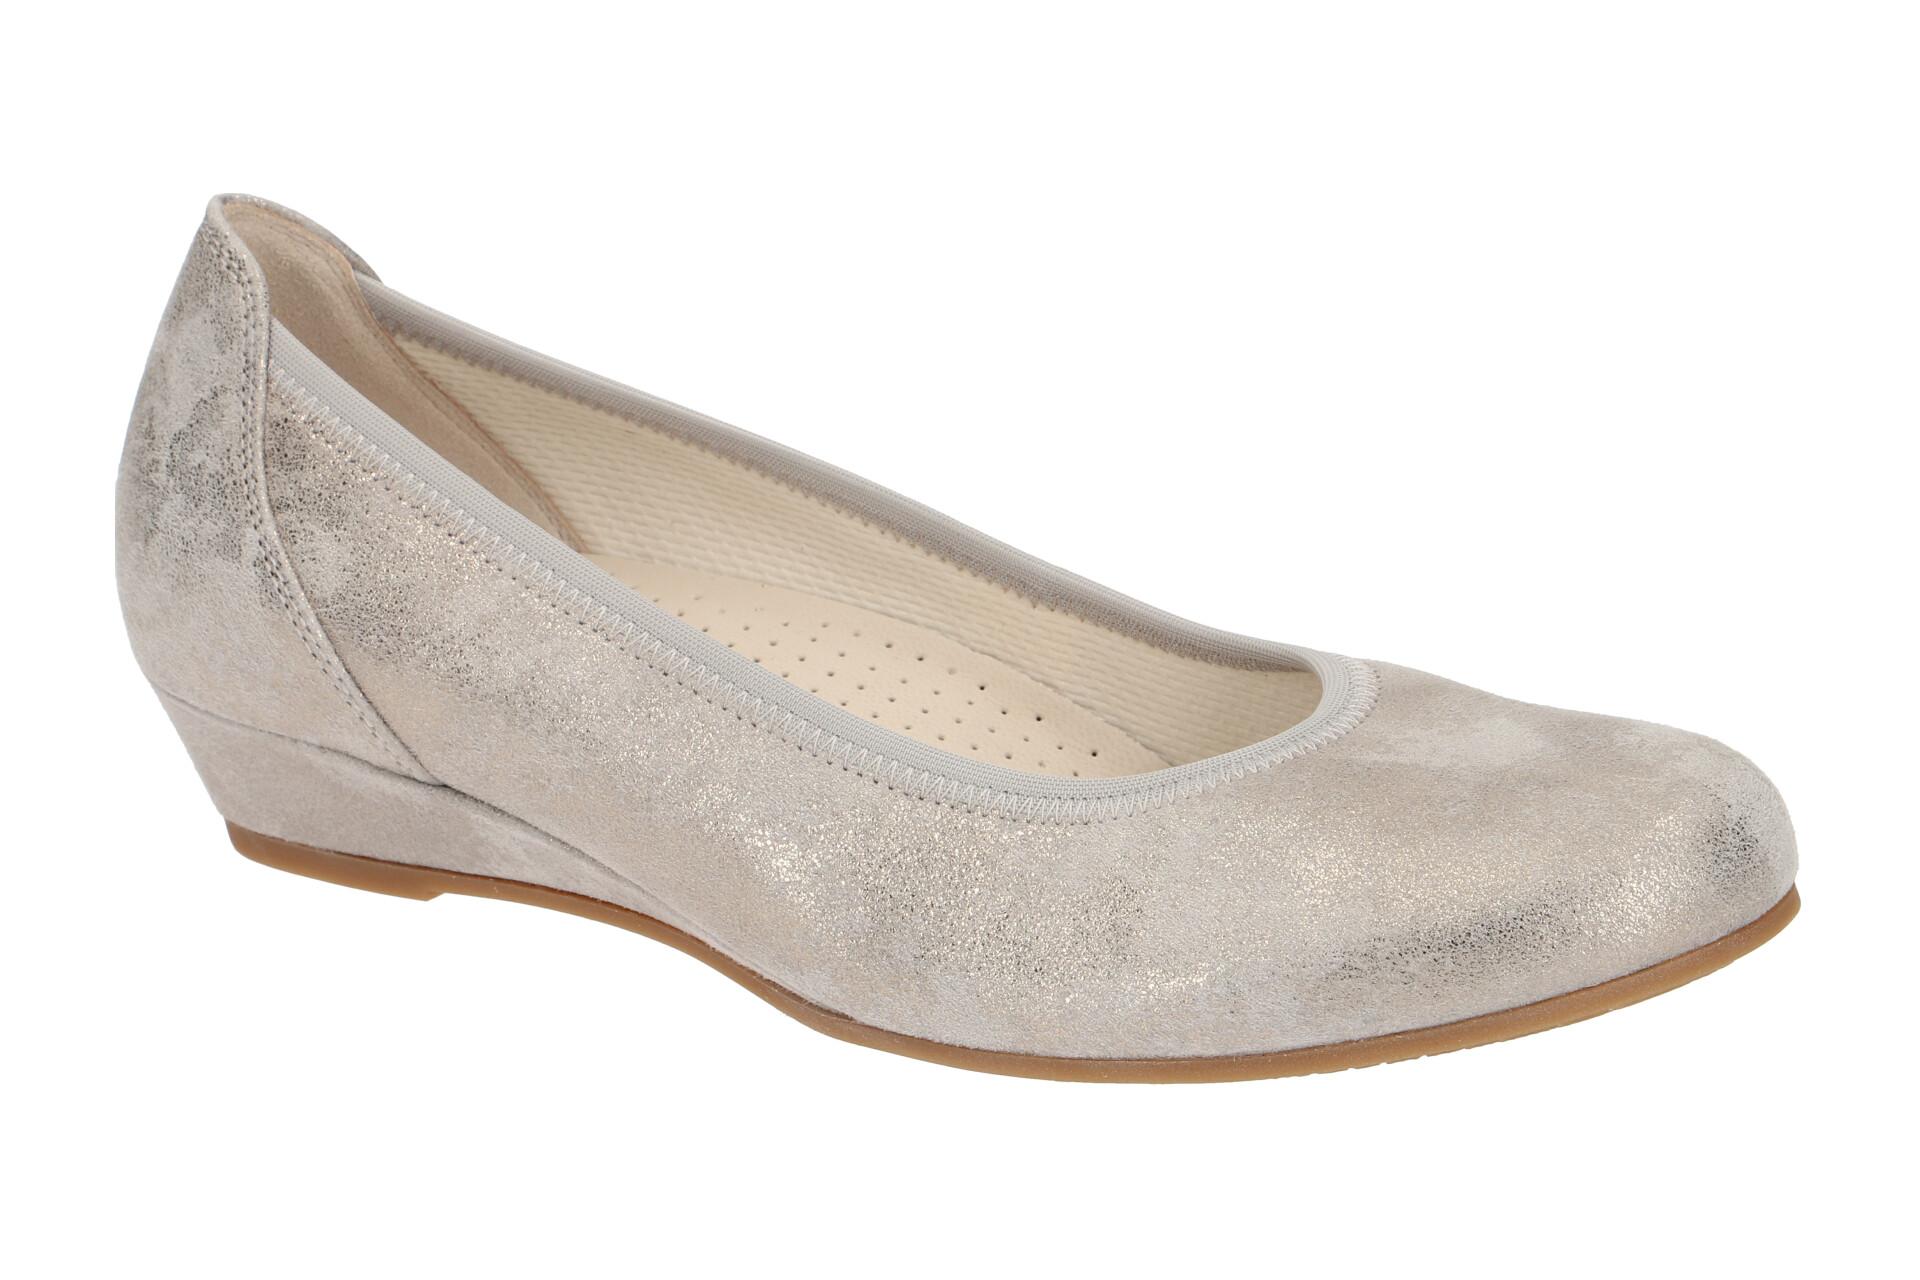 Gabor Neu Zu Kreta Ballerinas Details 93 690 Damen Schuhe Halbschuhe Grau 22 P0O8nwk